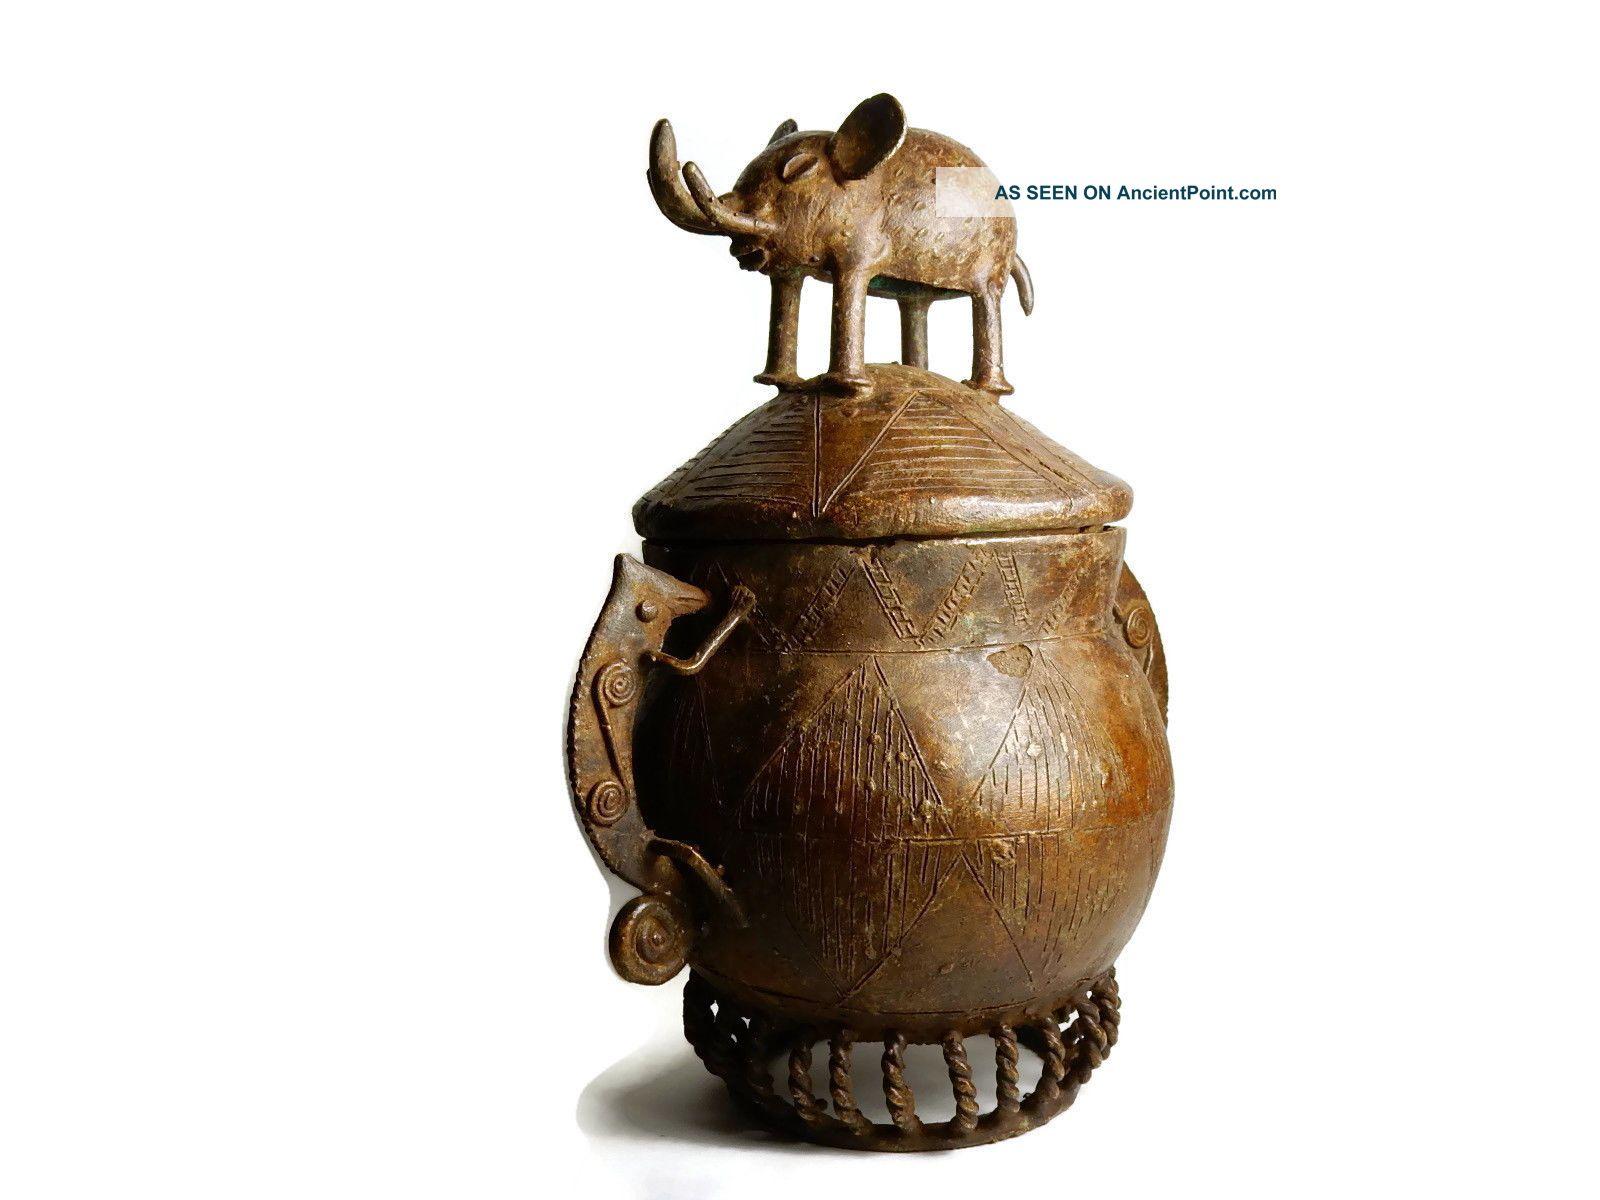 Rare African Tribal Antique Akan Ashanti Cast Bronze Medicine Pot Container Sculptures & Statues photo